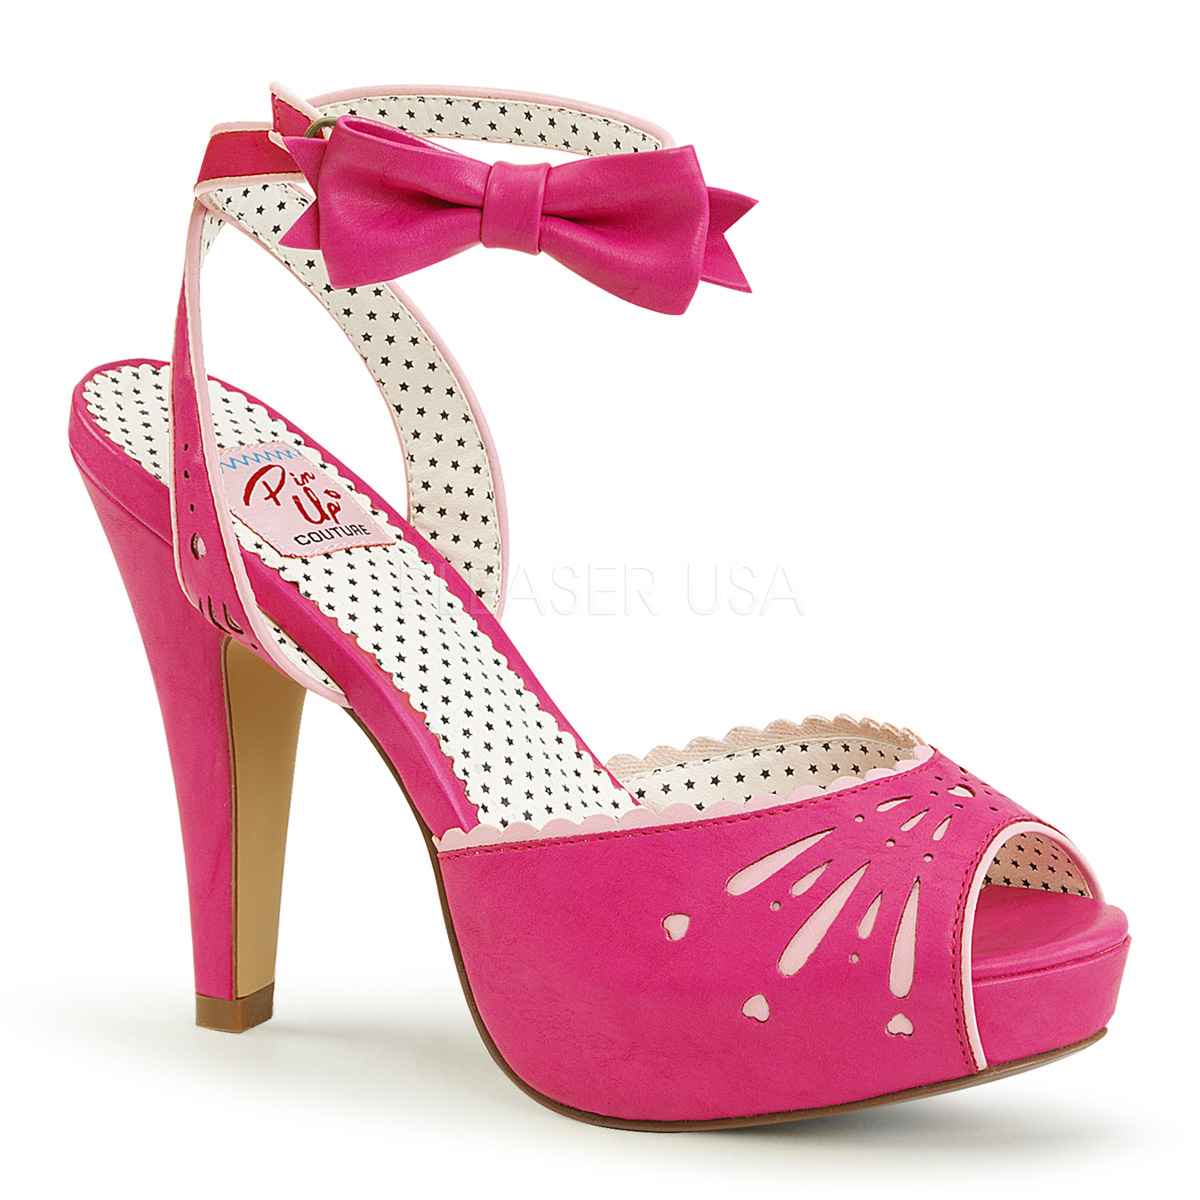 Pin Up Couture Damen Plateau Peep Toe Sandaletten Sandalen Bettie 01 hot pink